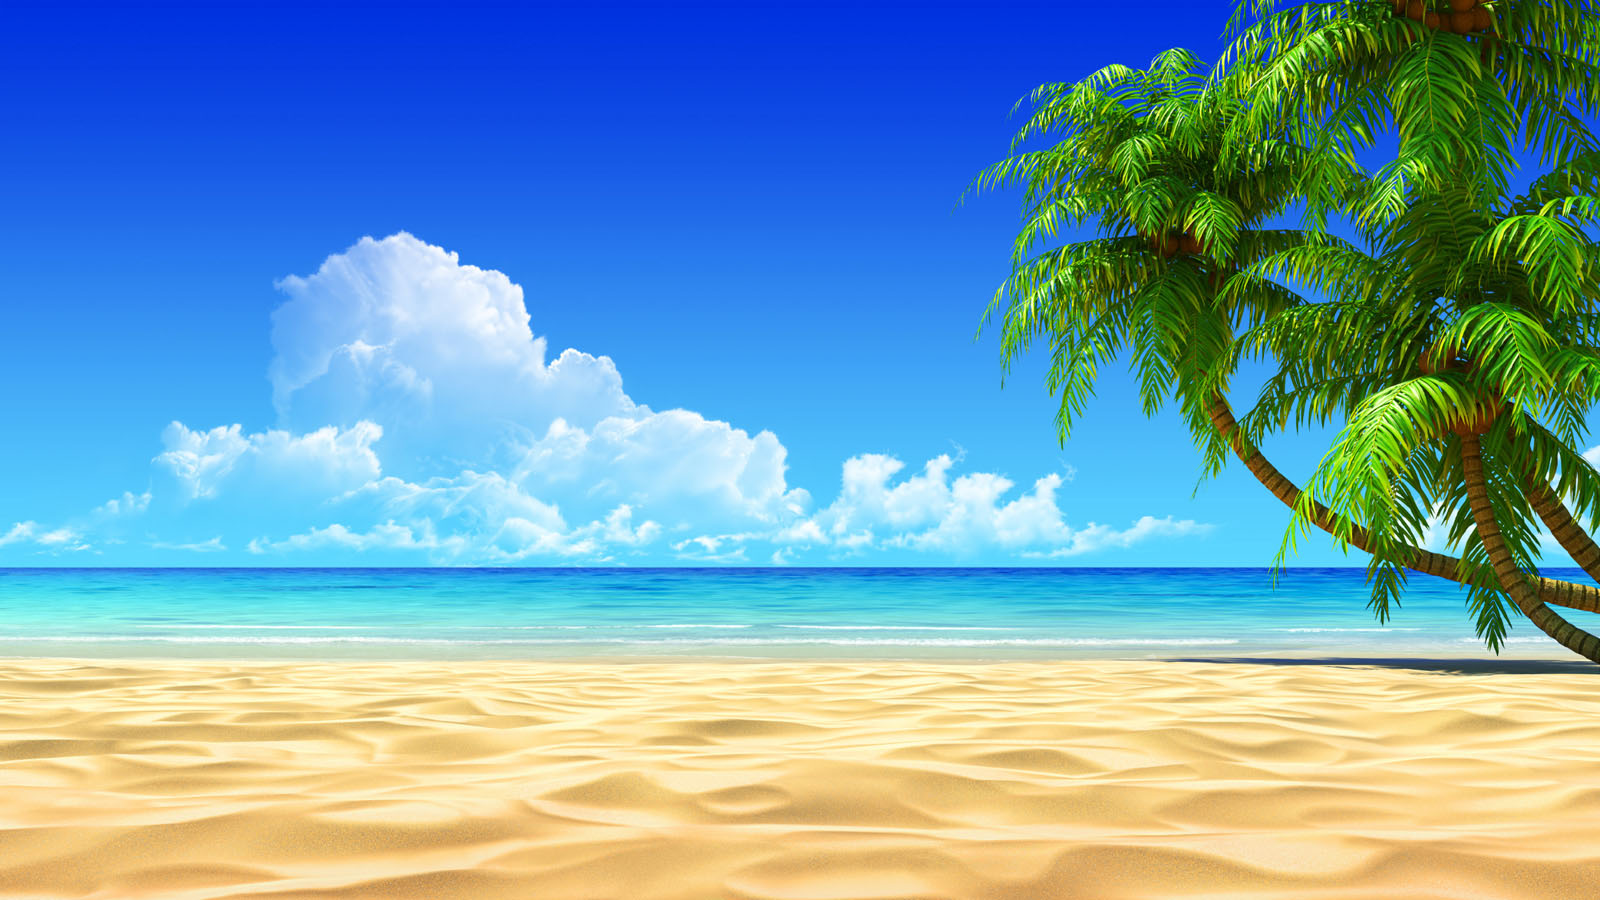 Beach HD Wallpapers Desktop Pictures One HD Wallpaper 1600x900